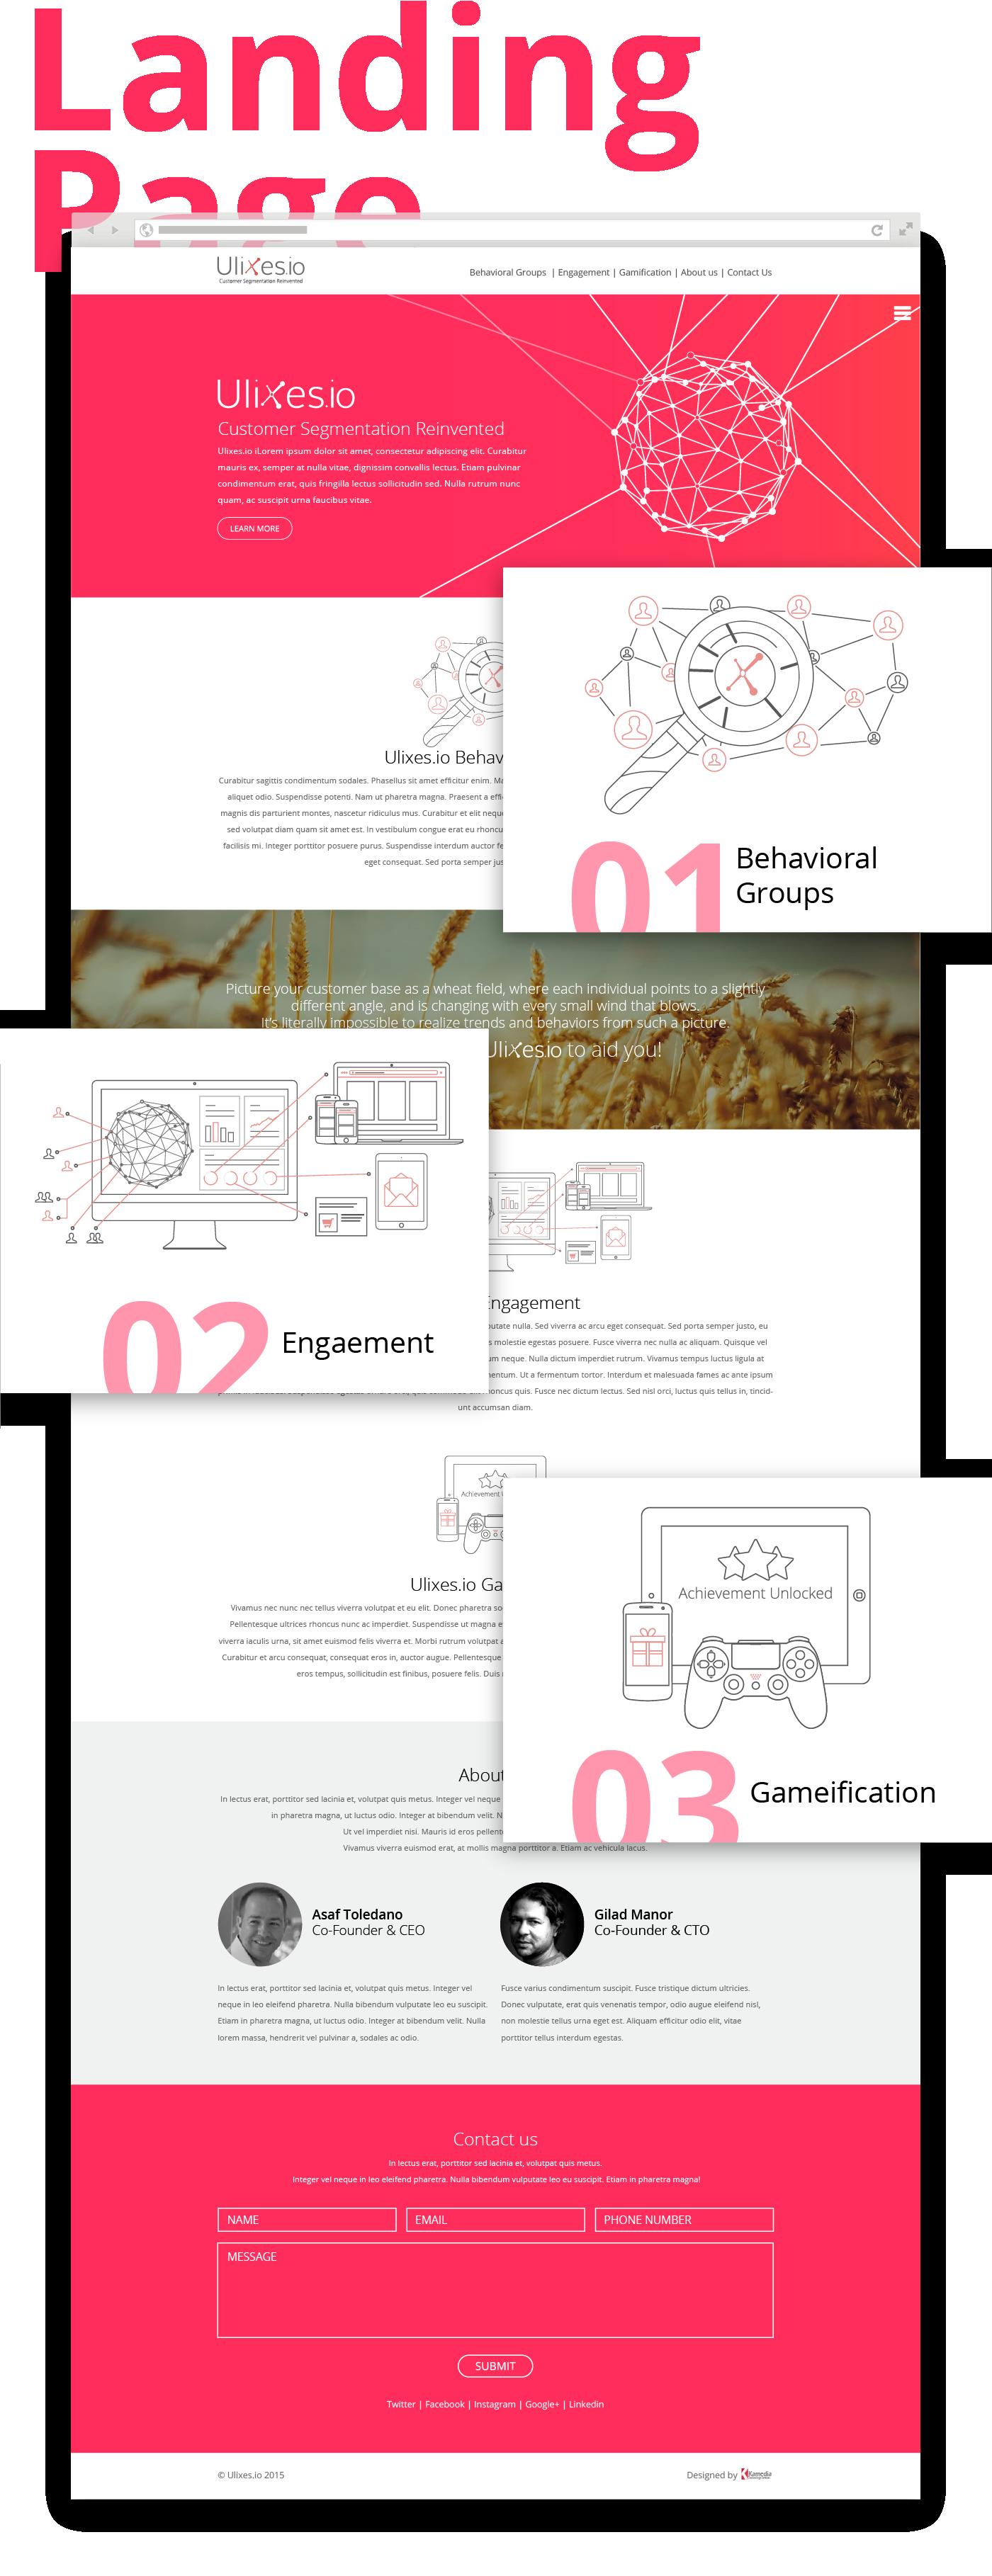 web app,landing page,analytics,segmentation,engaement,Gameification